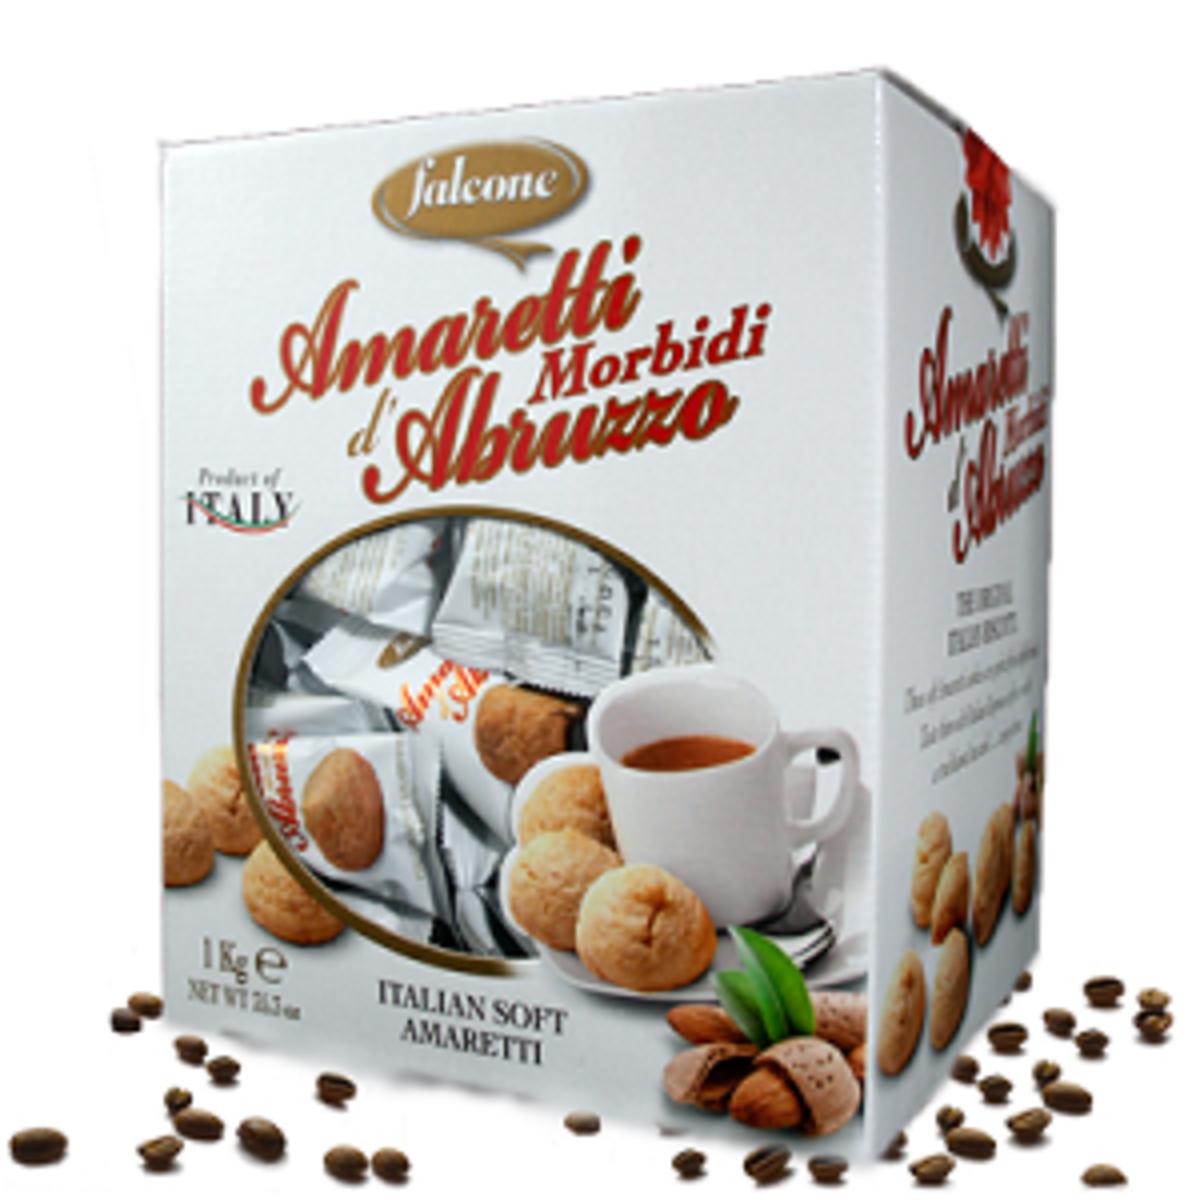 Amaretti Morbidi d´Abruzzo Италиански кантучини с бадем